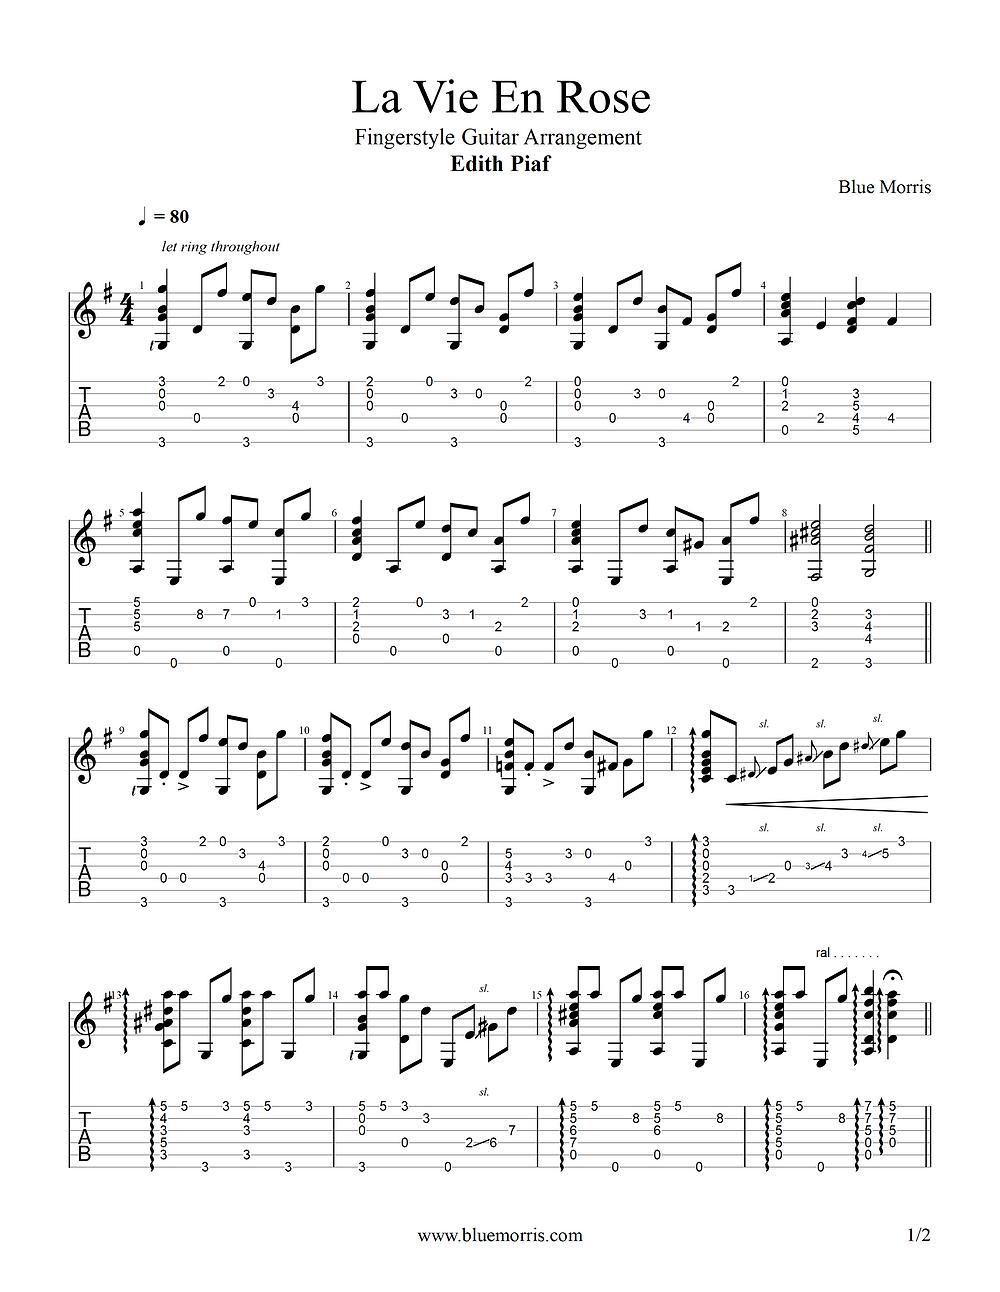 La Vie En Rose Fingerstyle guitar tab page 1